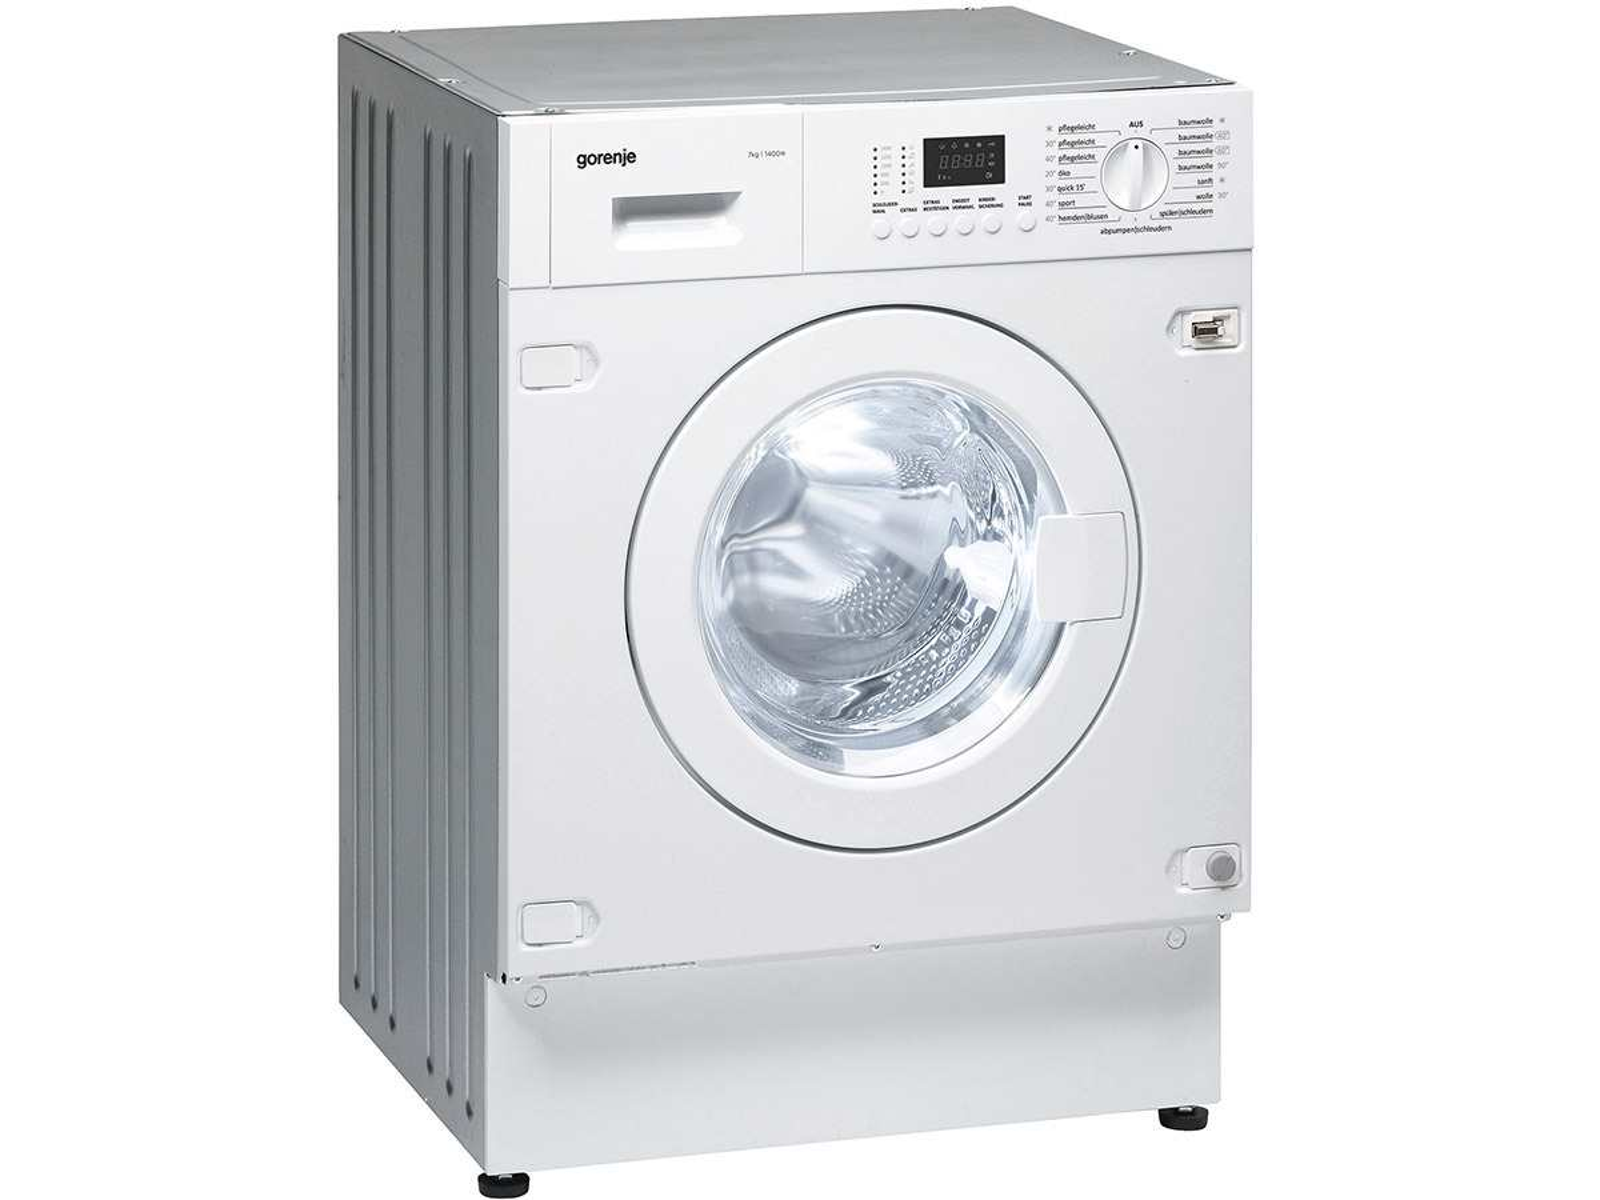 gorenje wi 74147 de einbauwaschmaschine. Black Bedroom Furniture Sets. Home Design Ideas